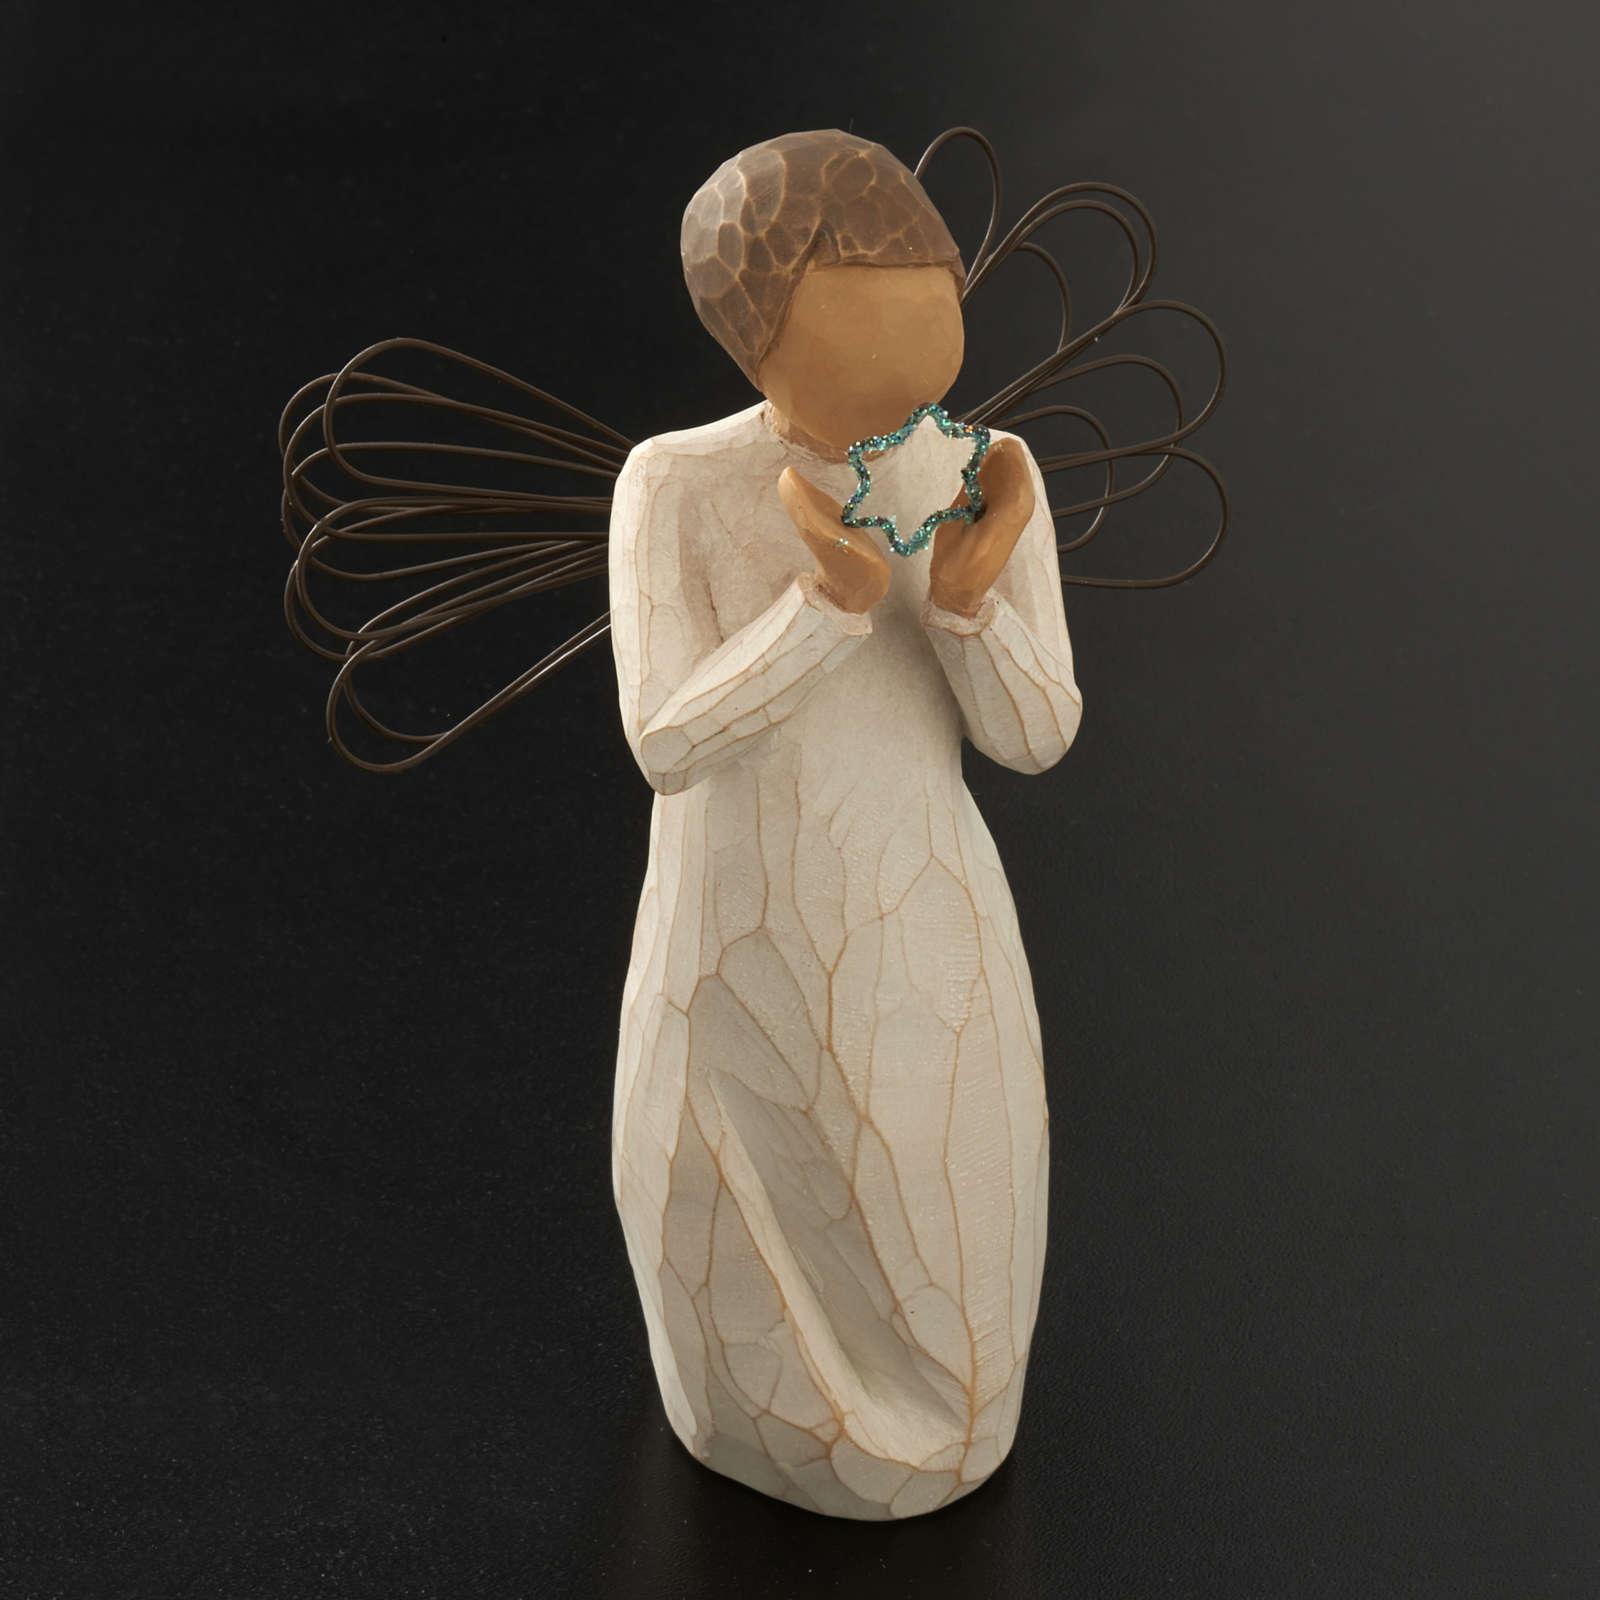 Willow Tree figurine - Bright Star 4